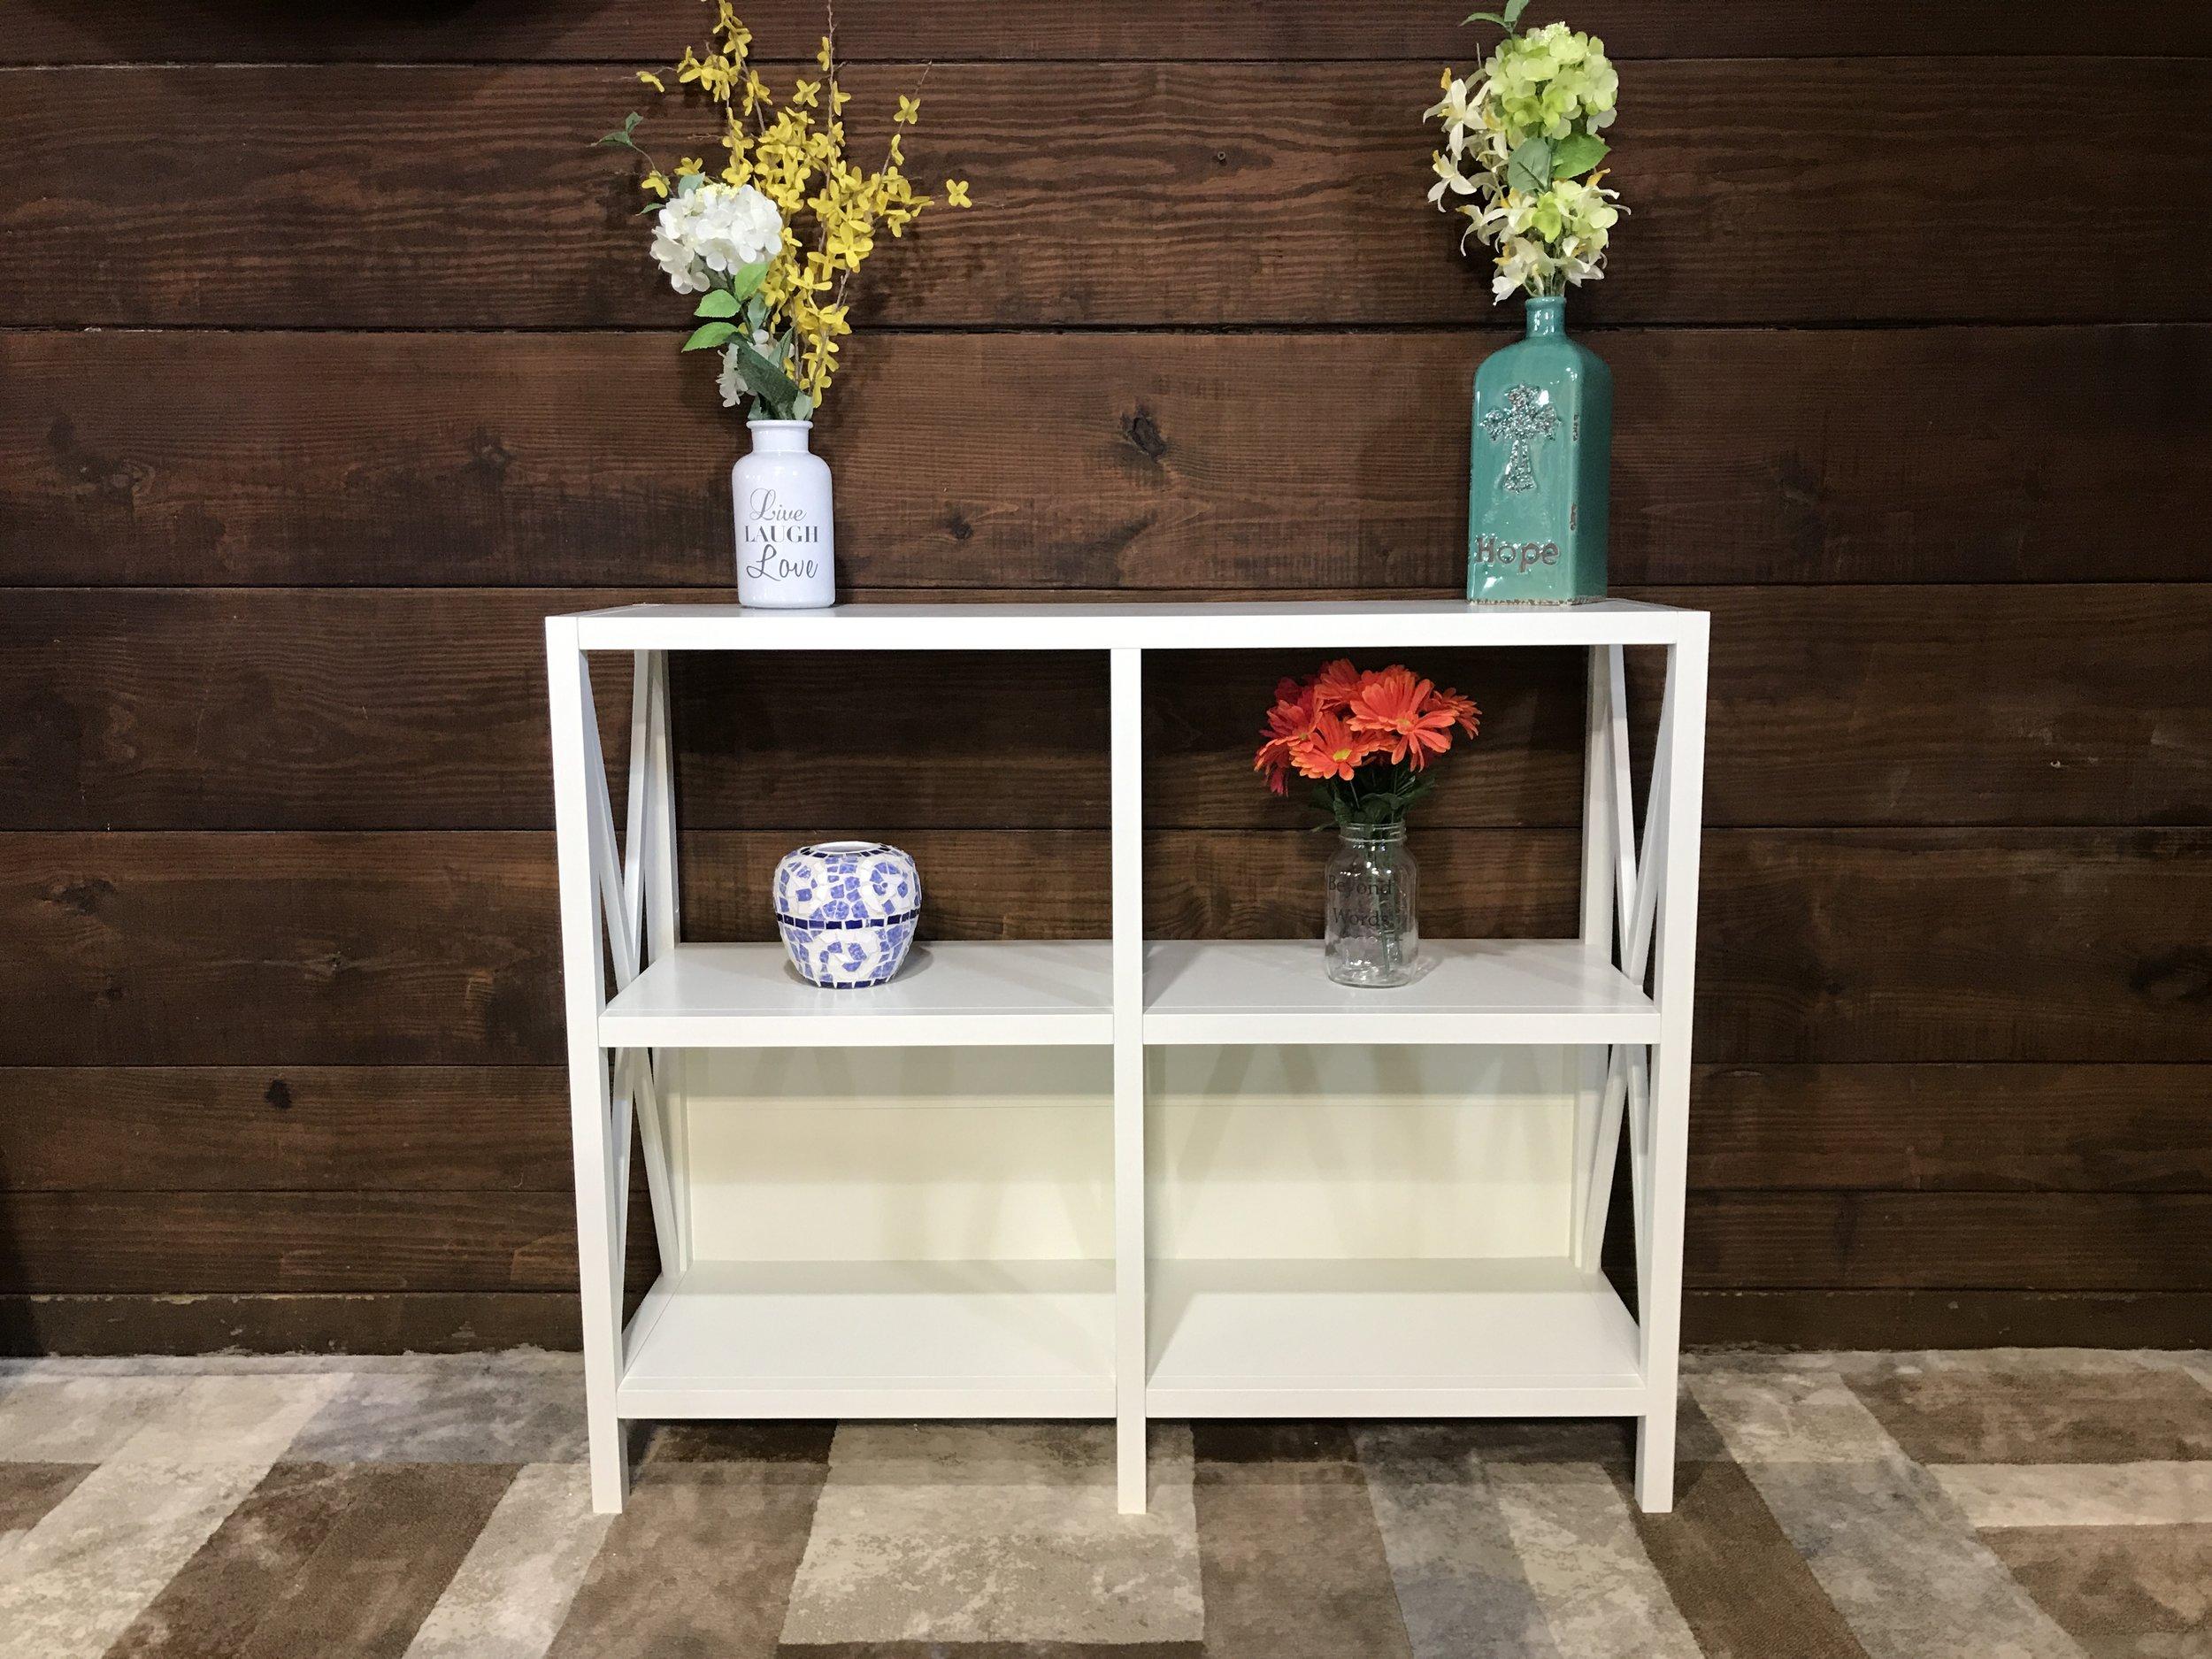 white to creative threshold bookcase bookcases sold see img living piq hamilton items horizontal